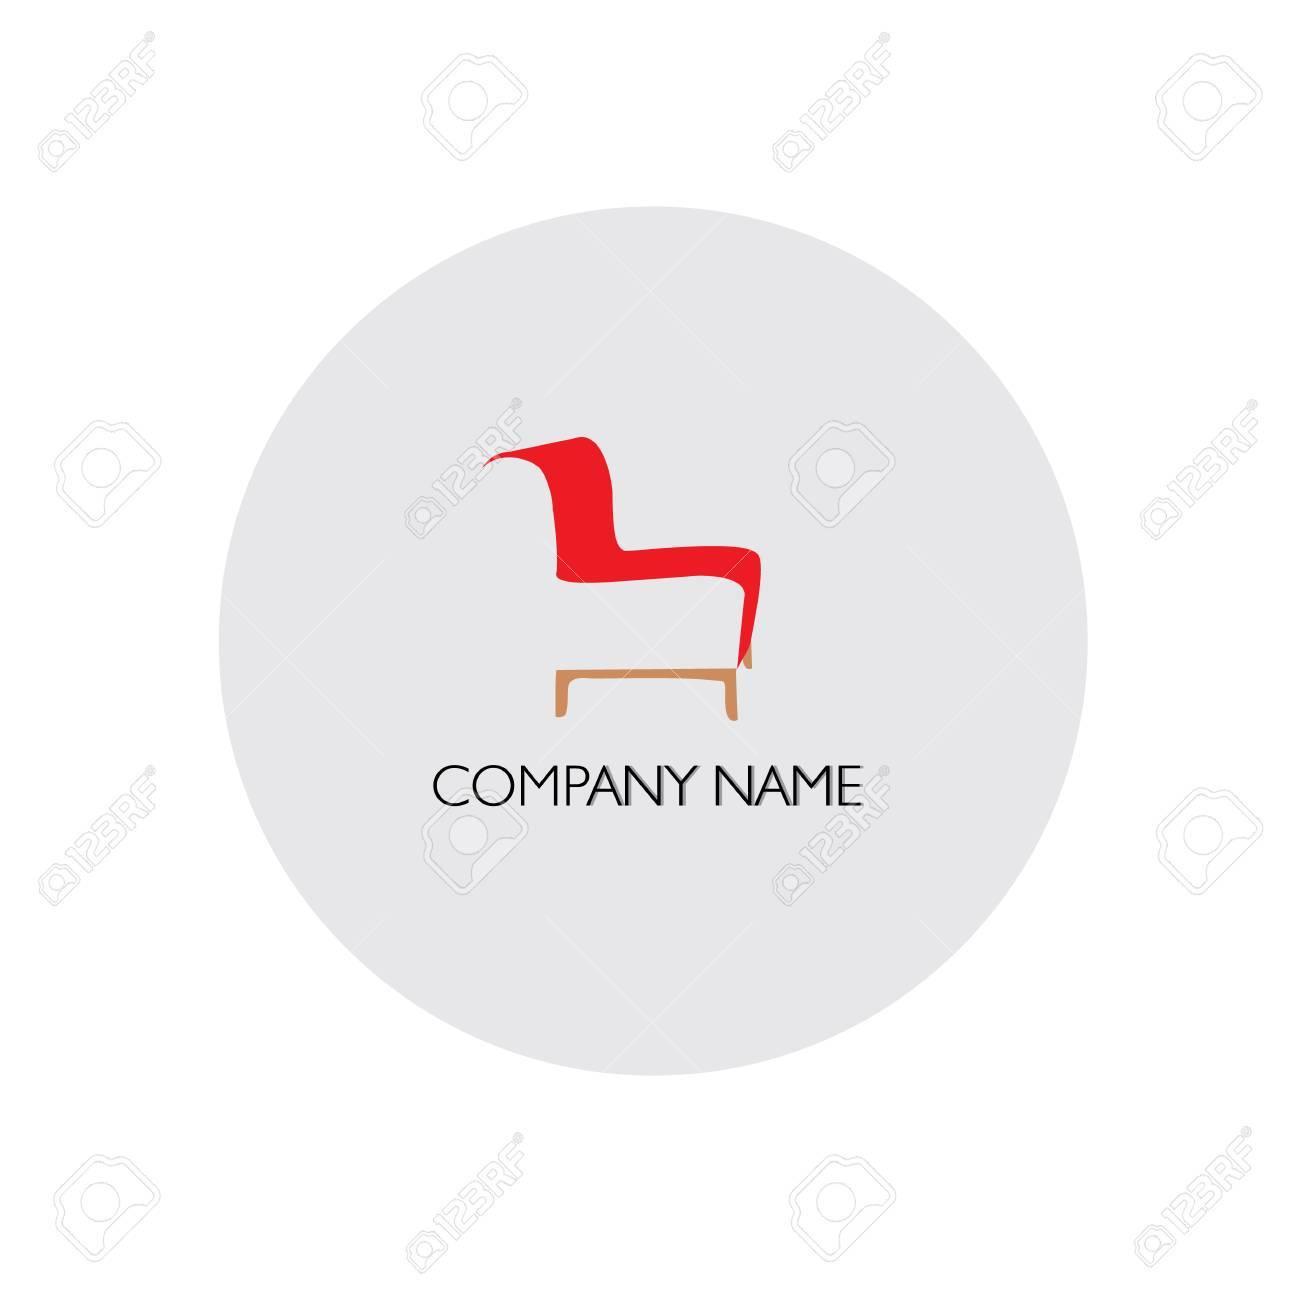 Furniture company name logo - 52757994